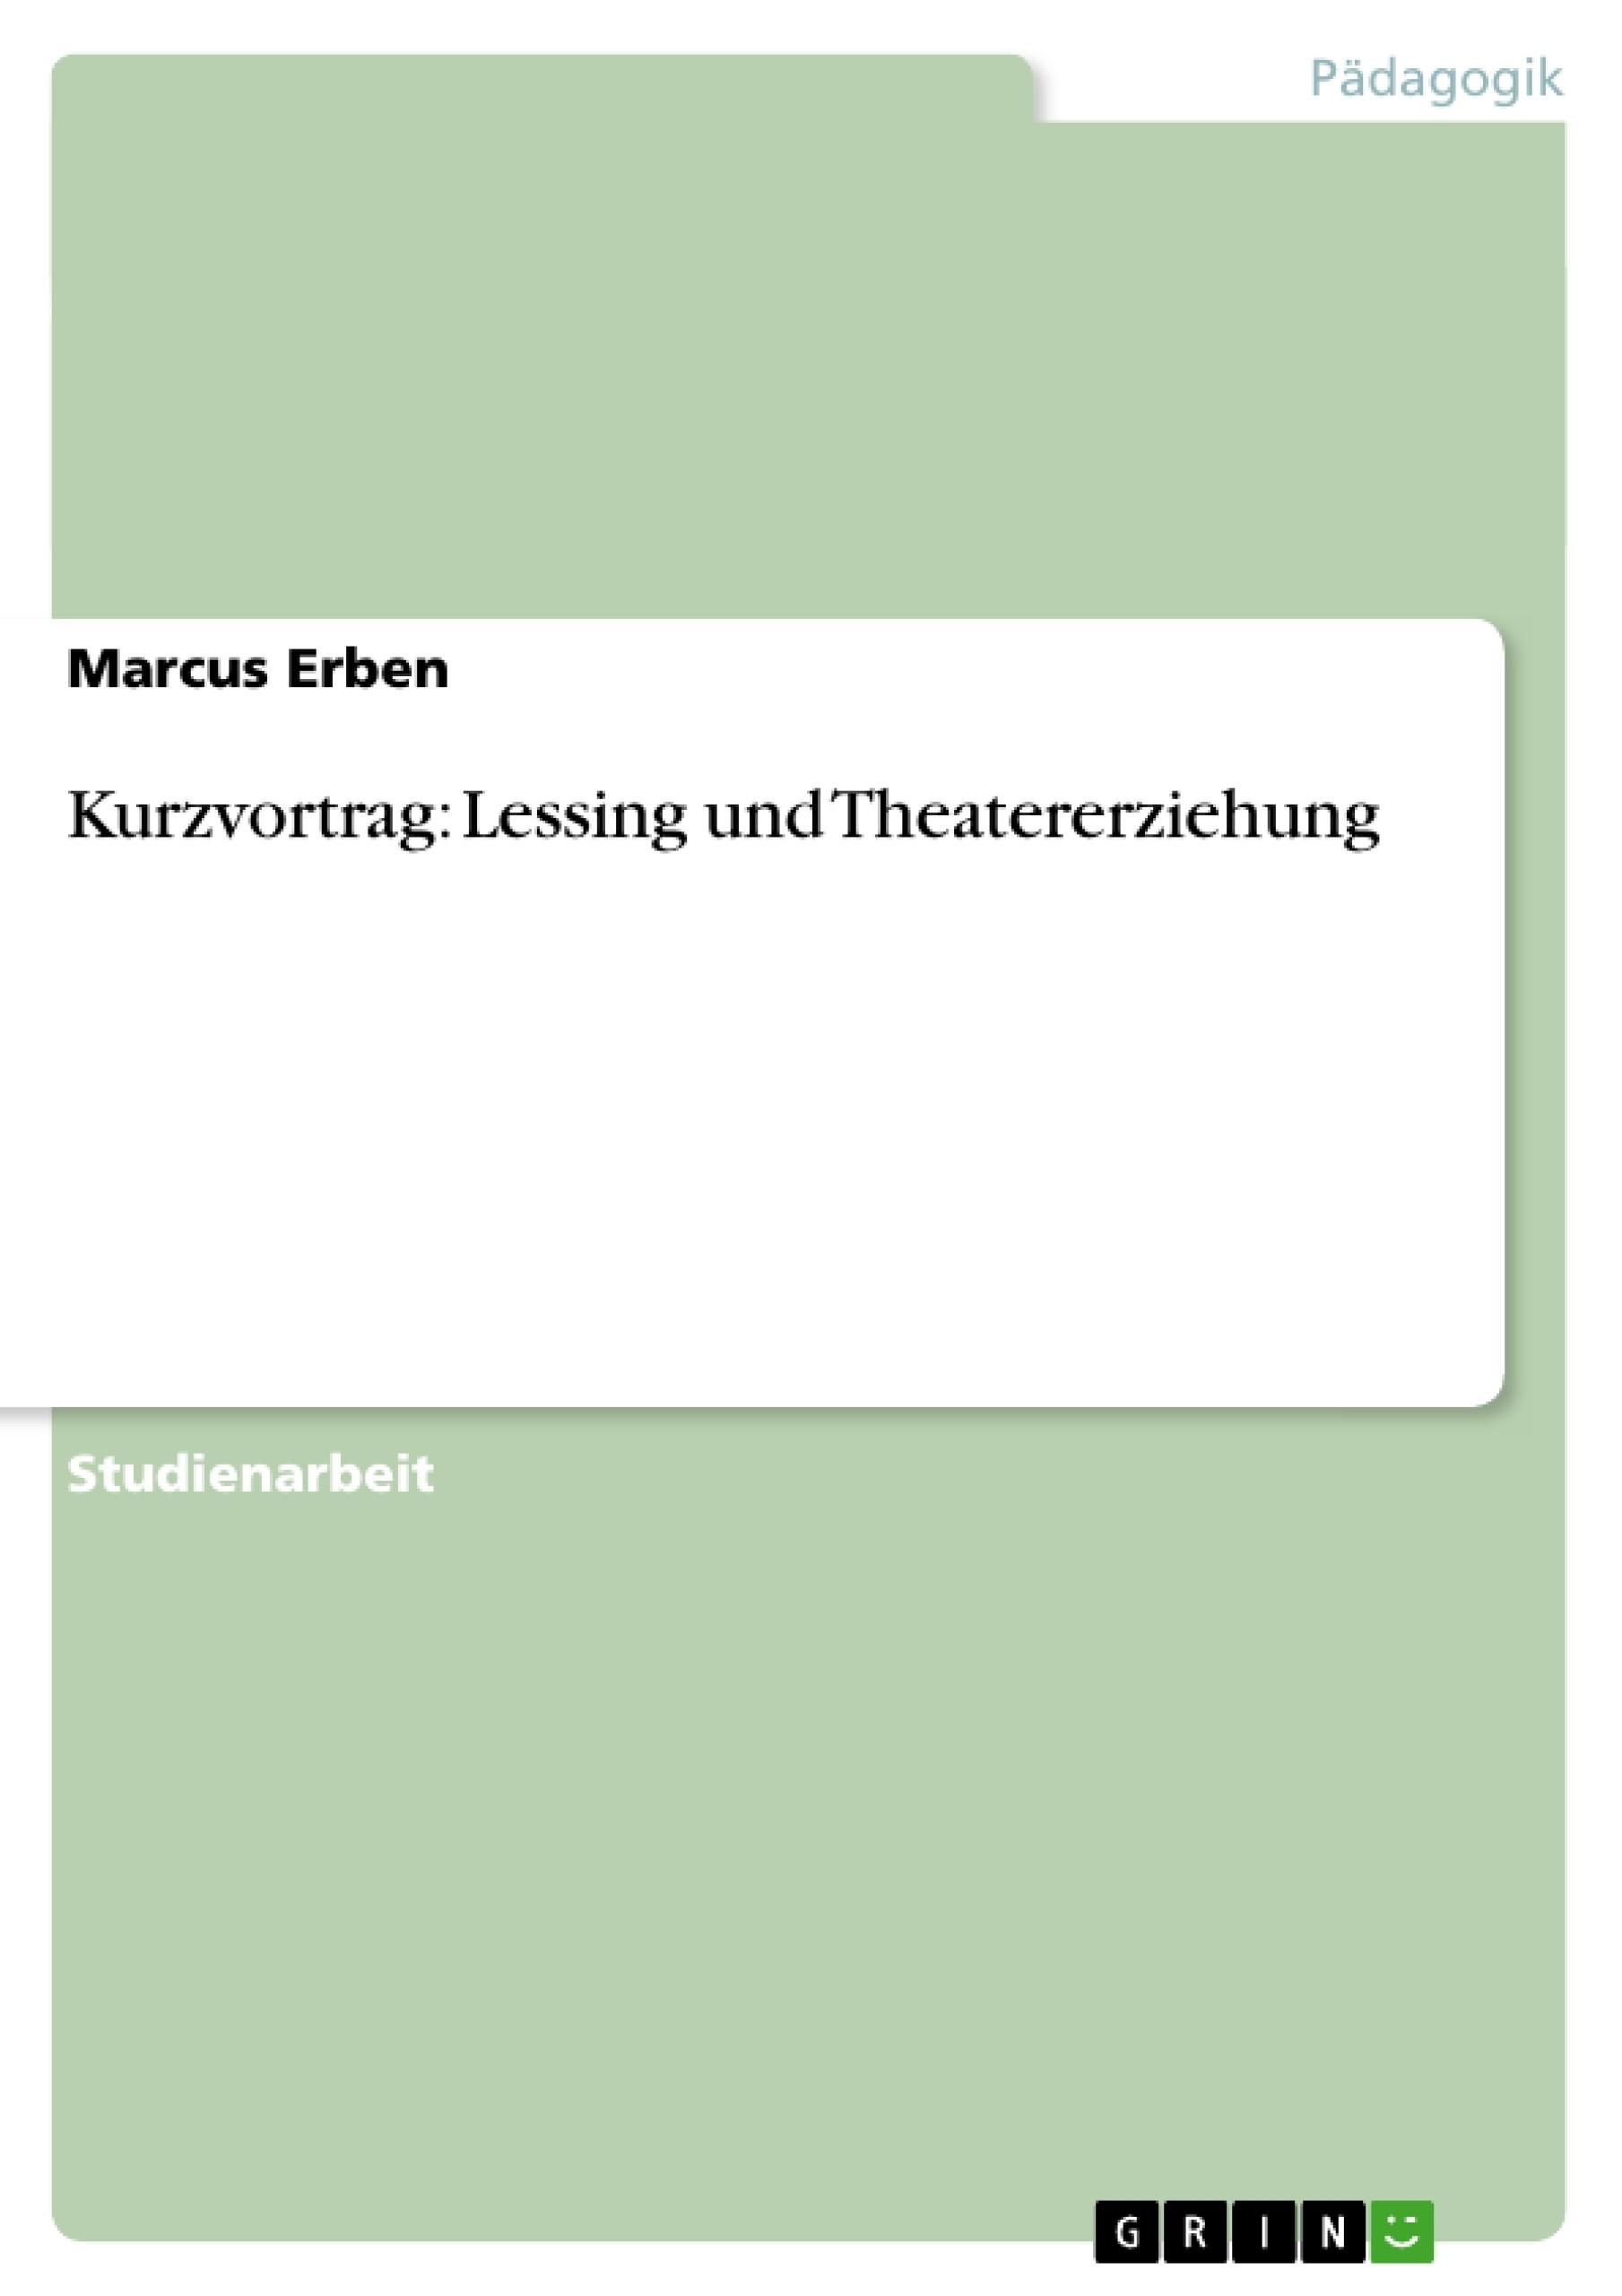 Titel: Kurzvortrag: Lessing und Theatererziehung